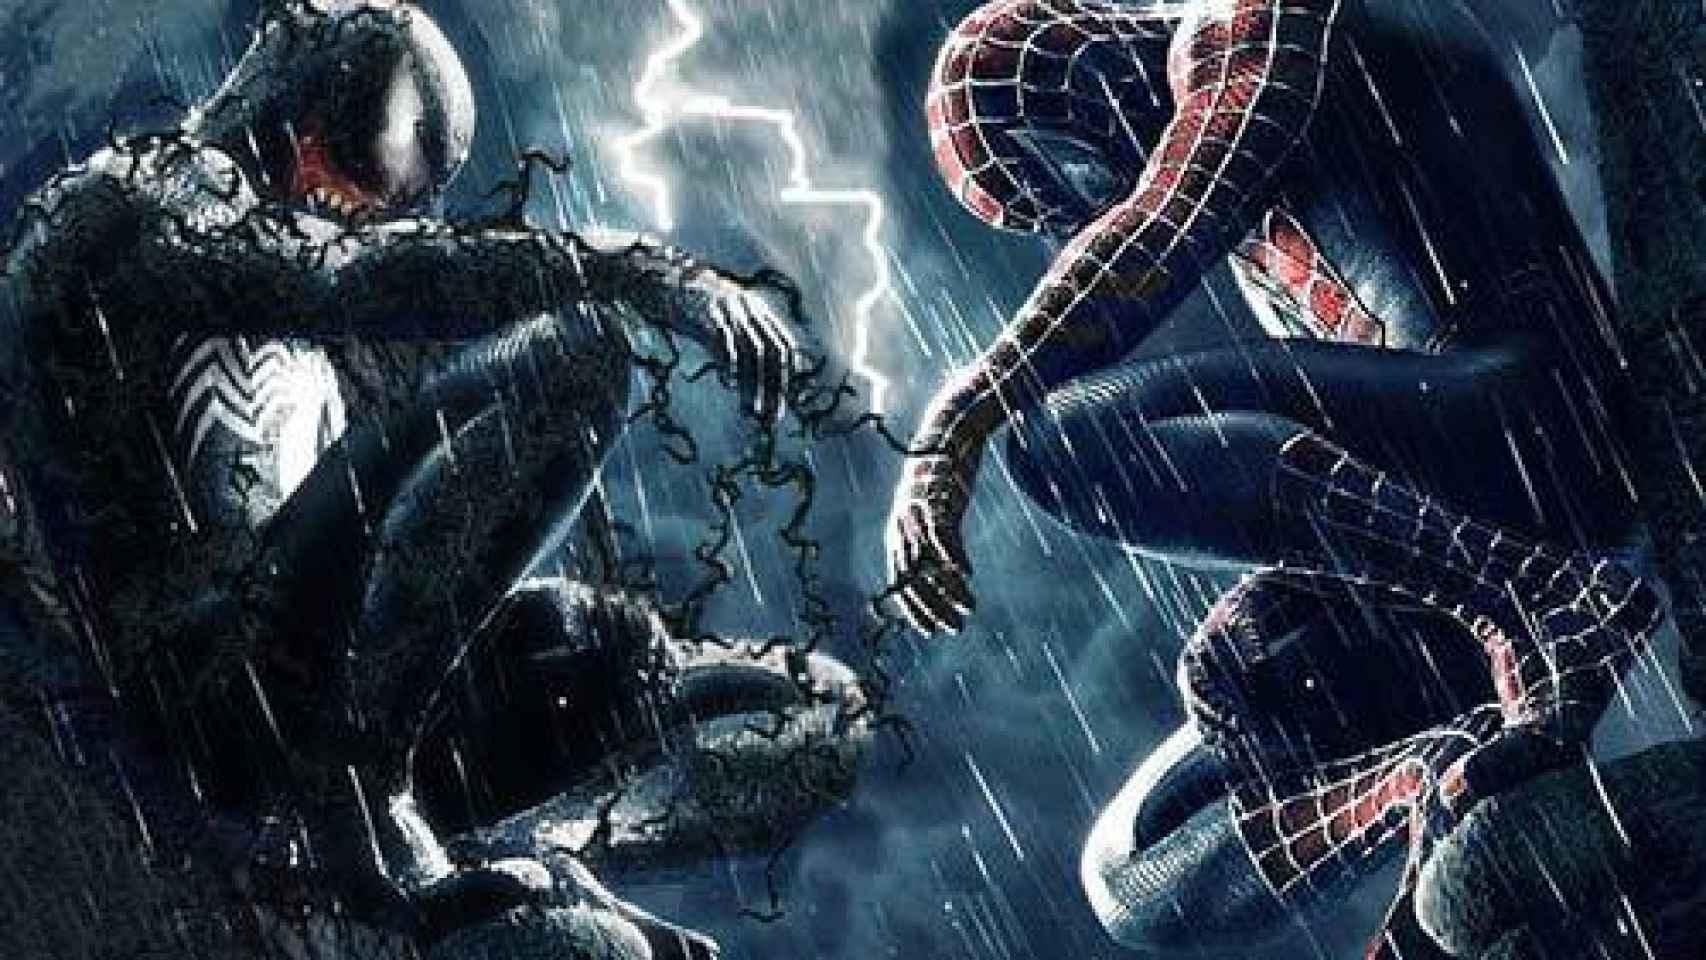 El maligno Venom frente a Spiderman.